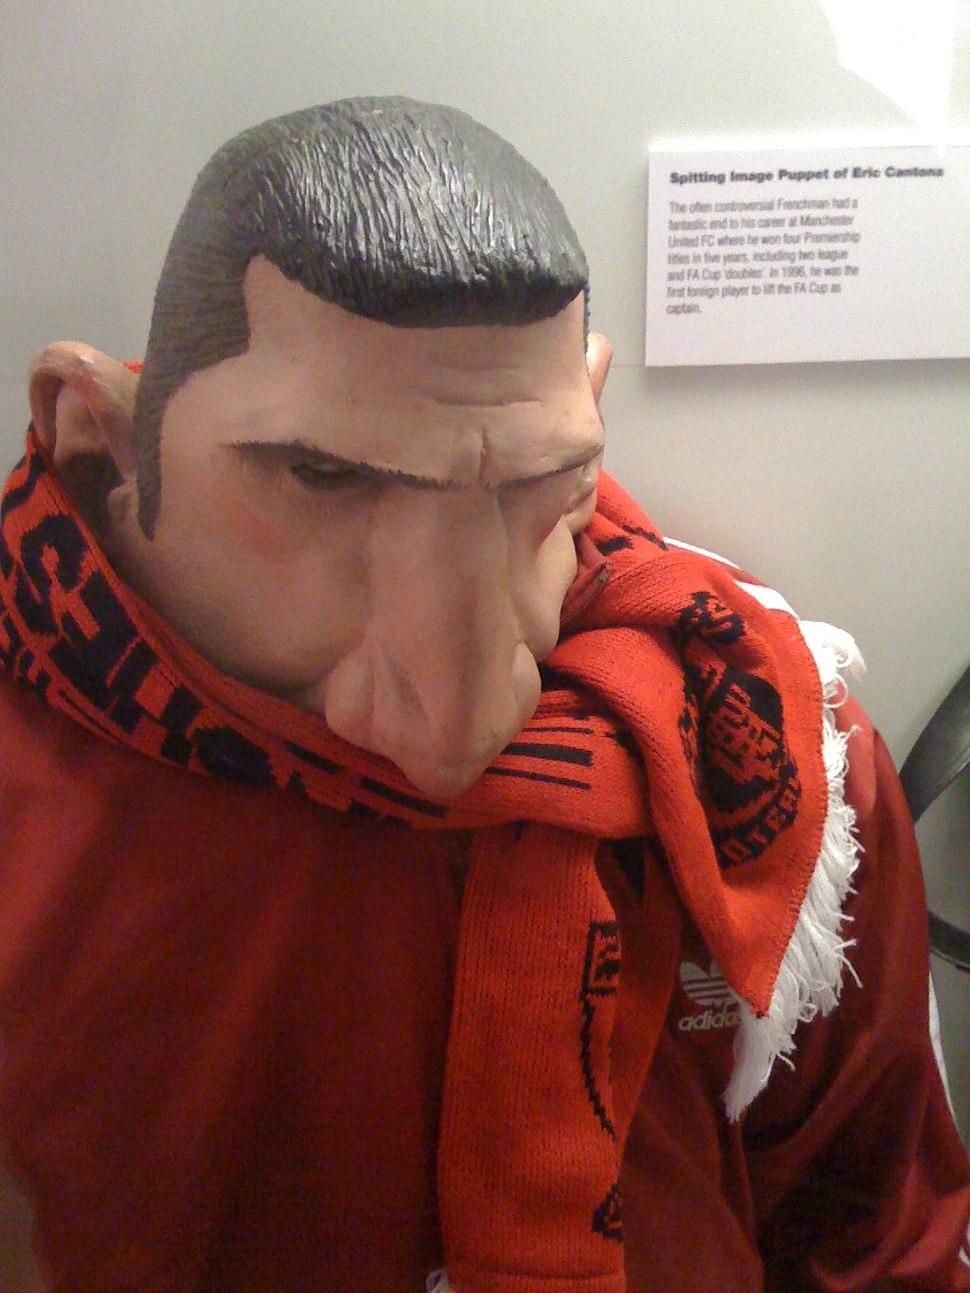 Spitting Image Puppet of Eric Cantona (2956625432)